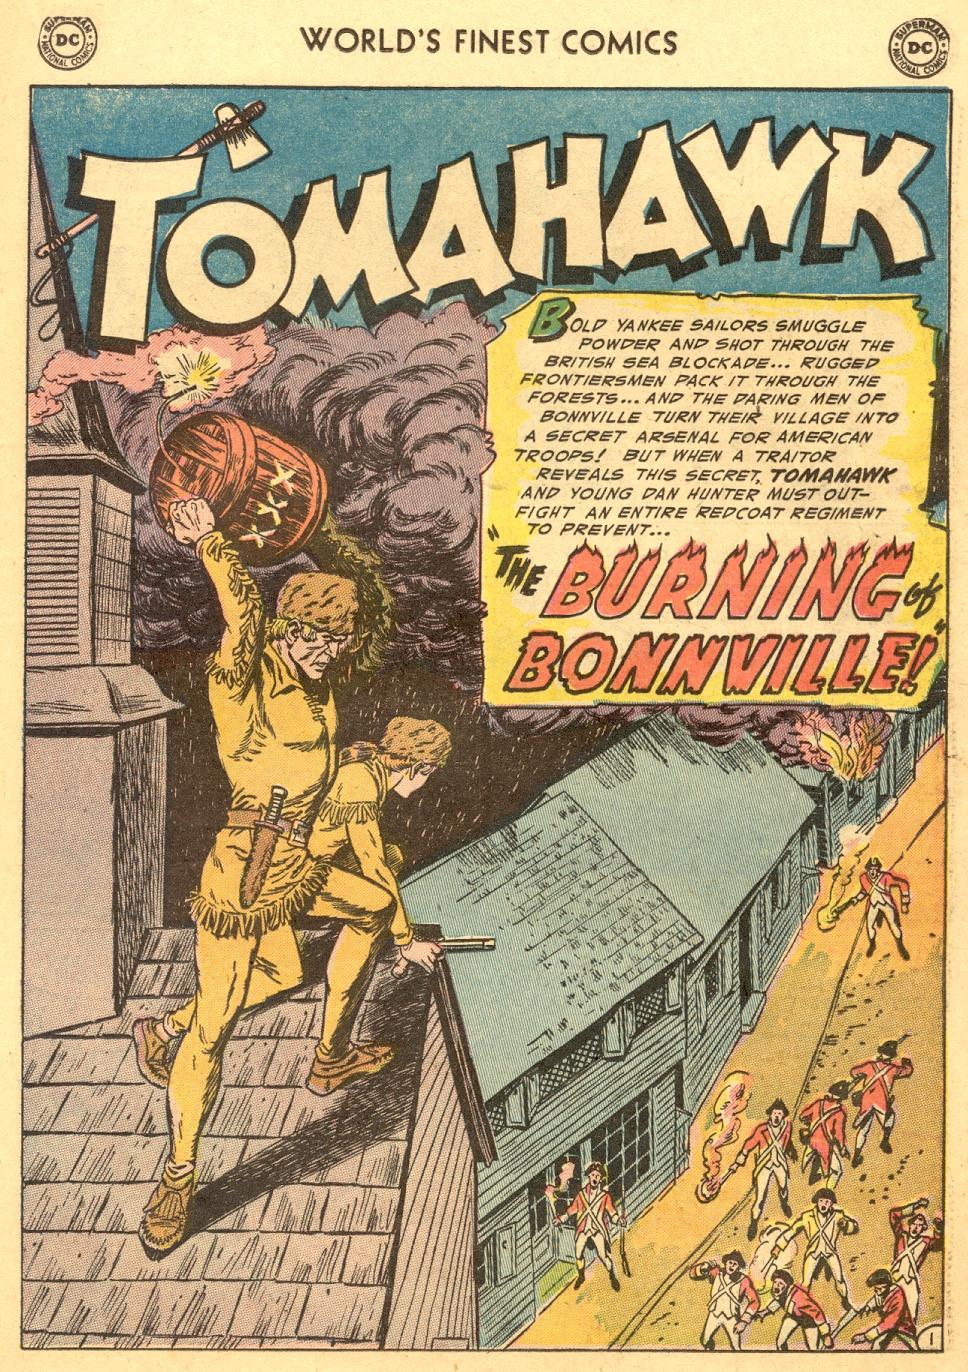 Read online World's Finest Comics comic -  Issue #70 - 37